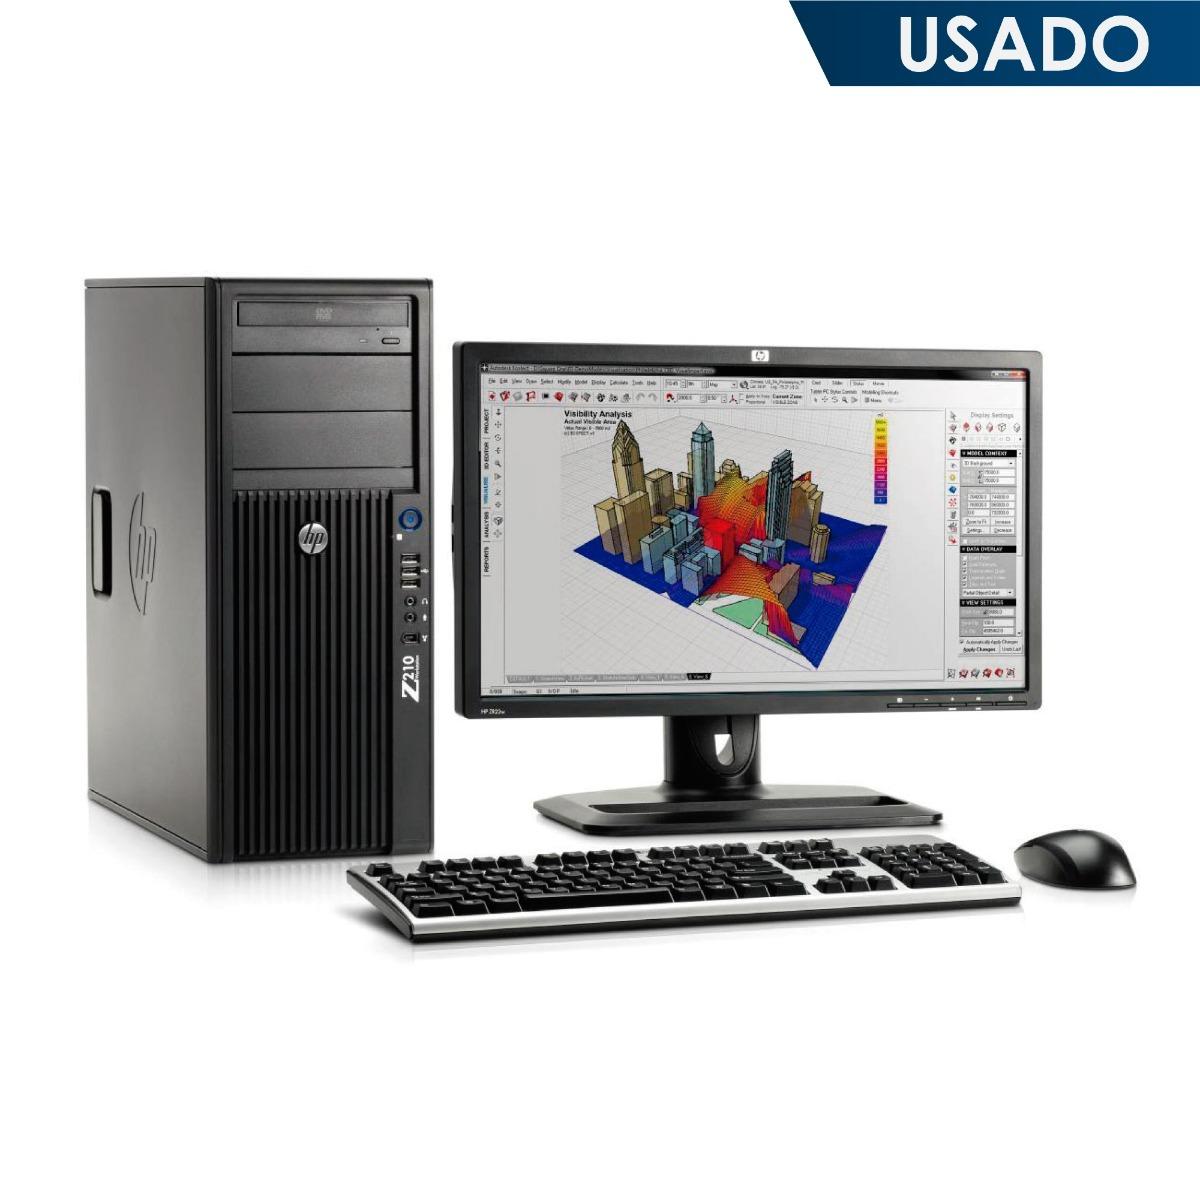 Cpu Hp Z620 Workstation Xeon 24 Gb / 500gb + Monitor 19 - $ 1 273 900